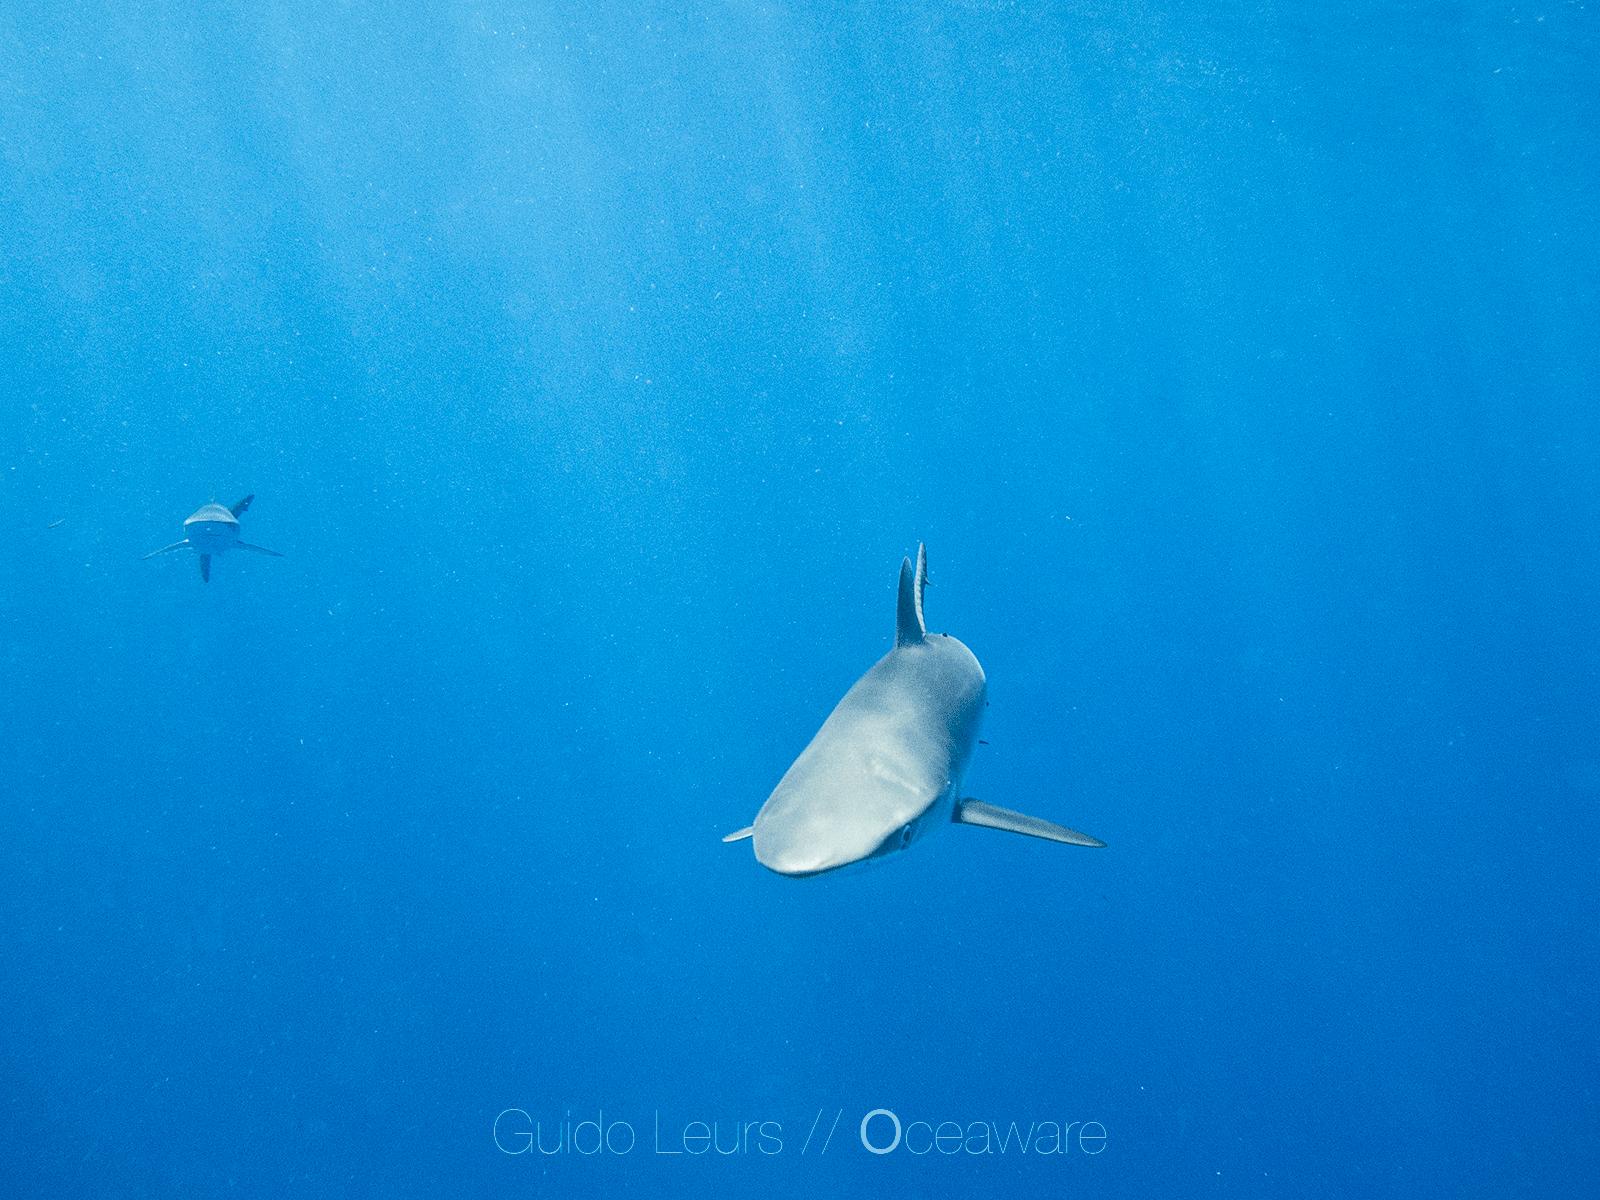 Carcharhinus_falciformis_GuidoLeurs2018_02